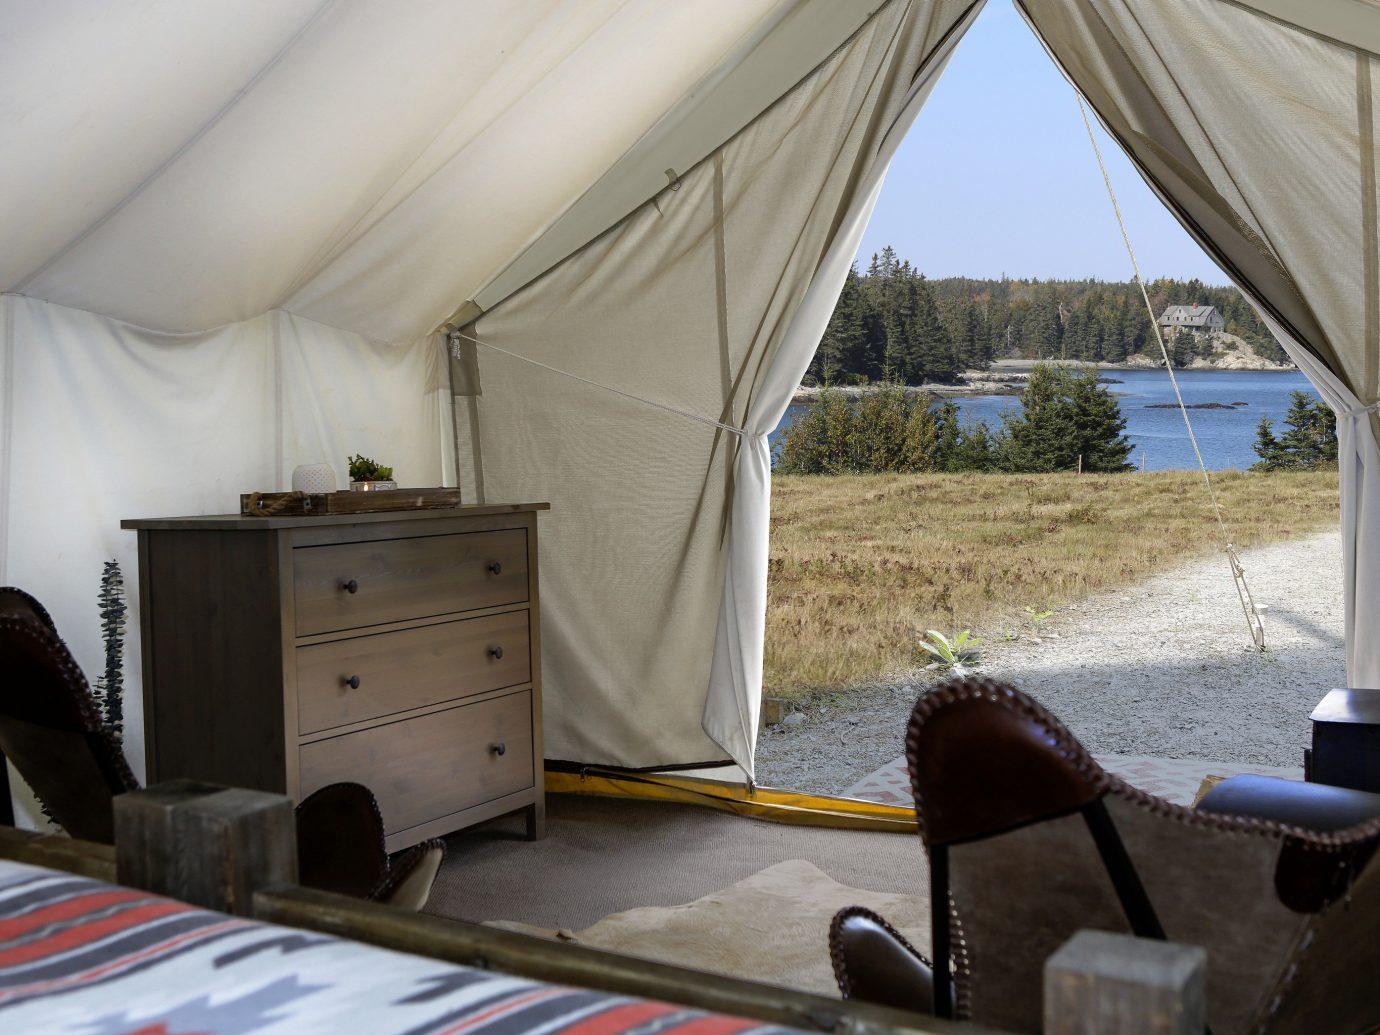 Glamping Outdoors + Adventure Weekend Getaways tent car vehicle window house